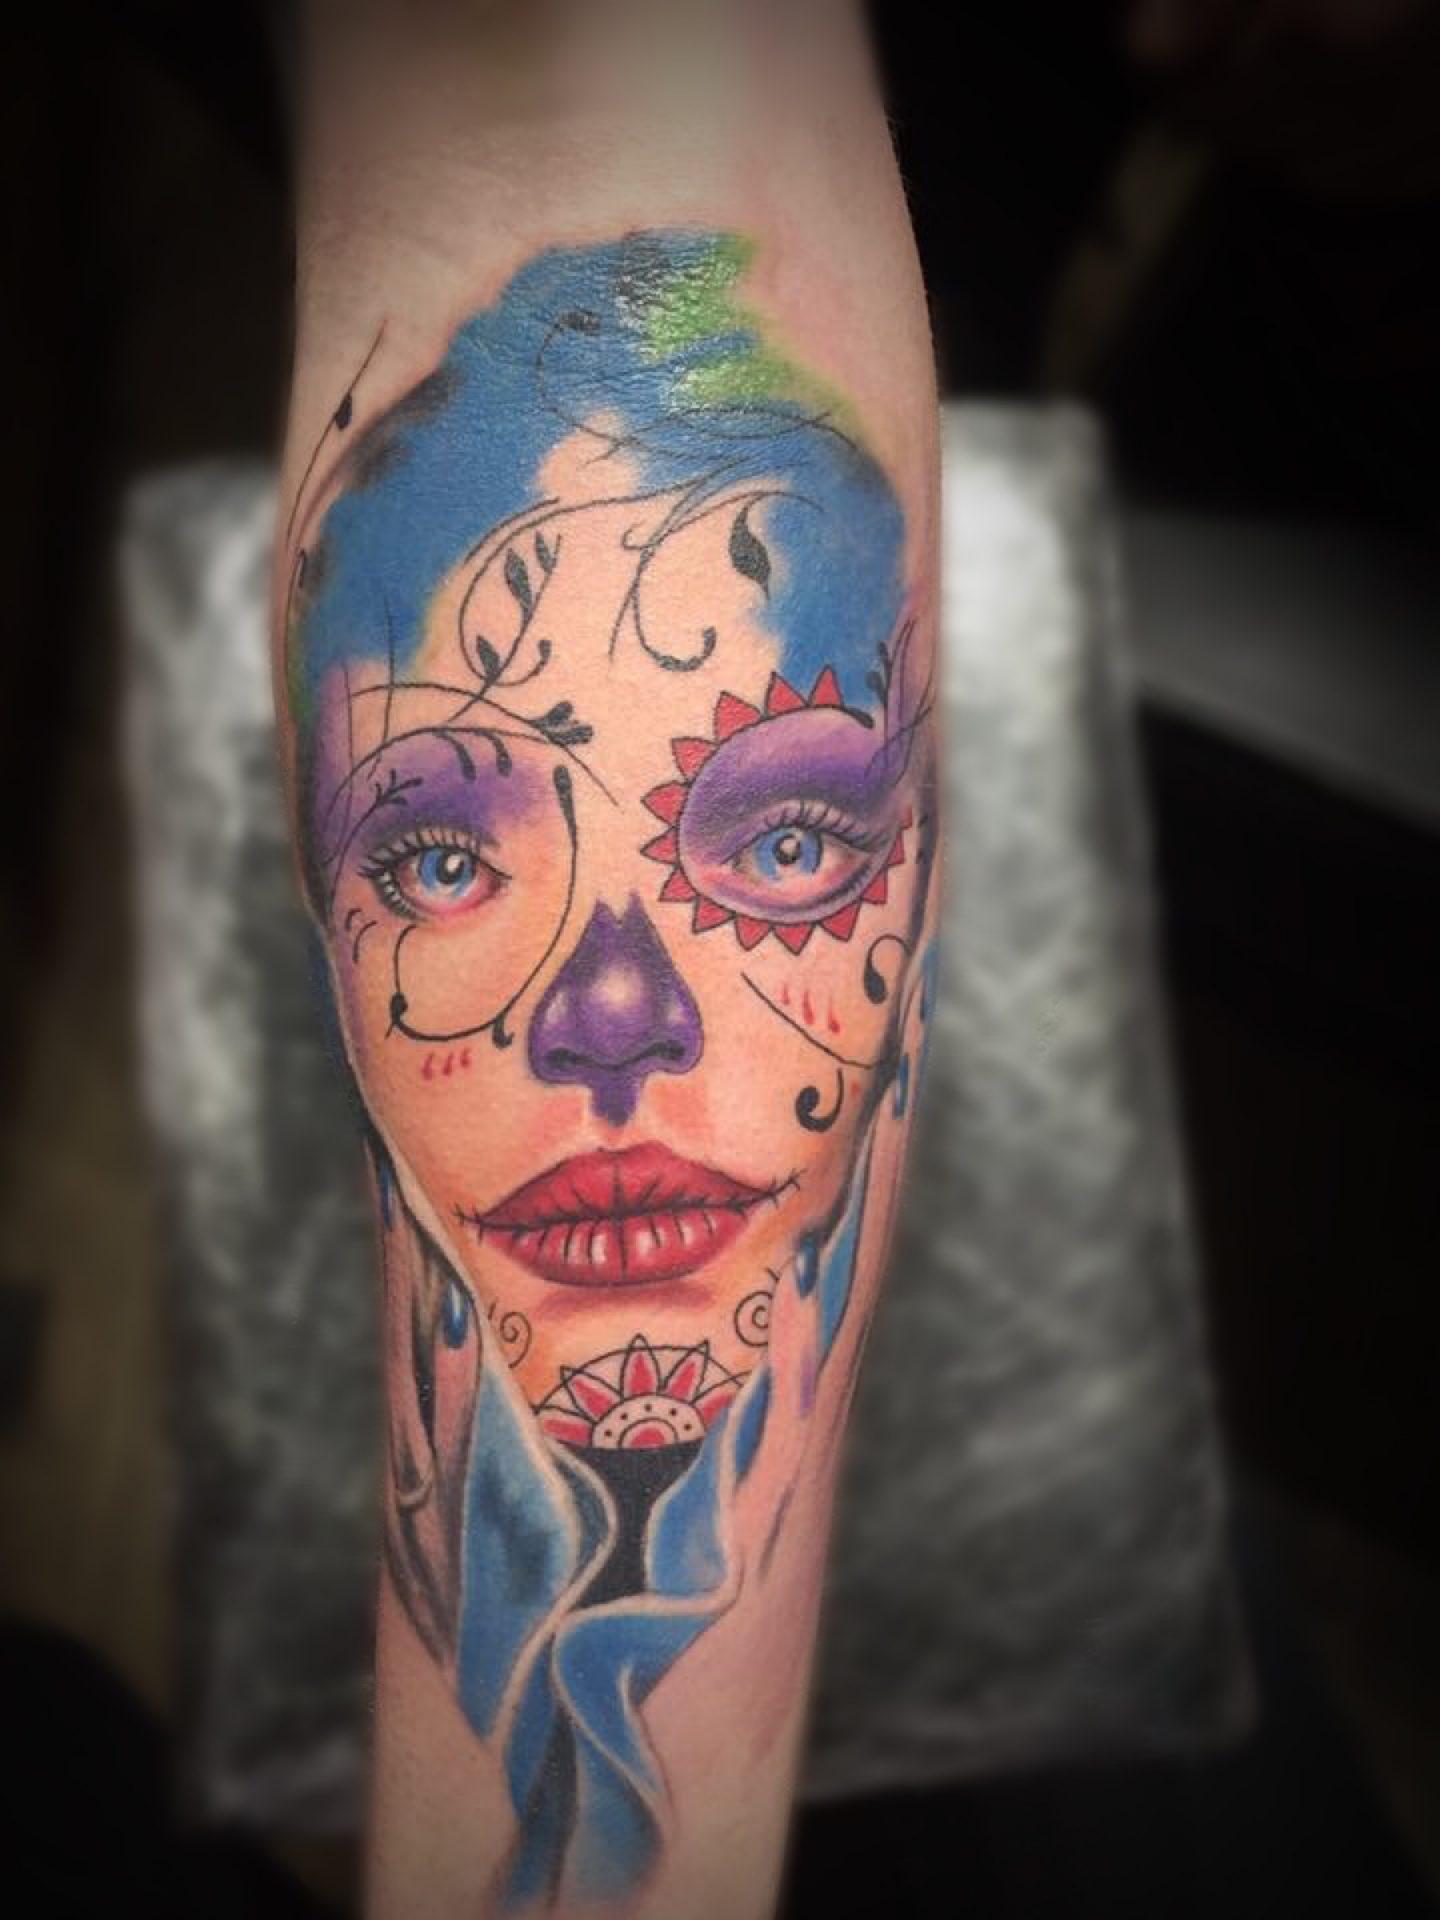 dezired inkz tattoo